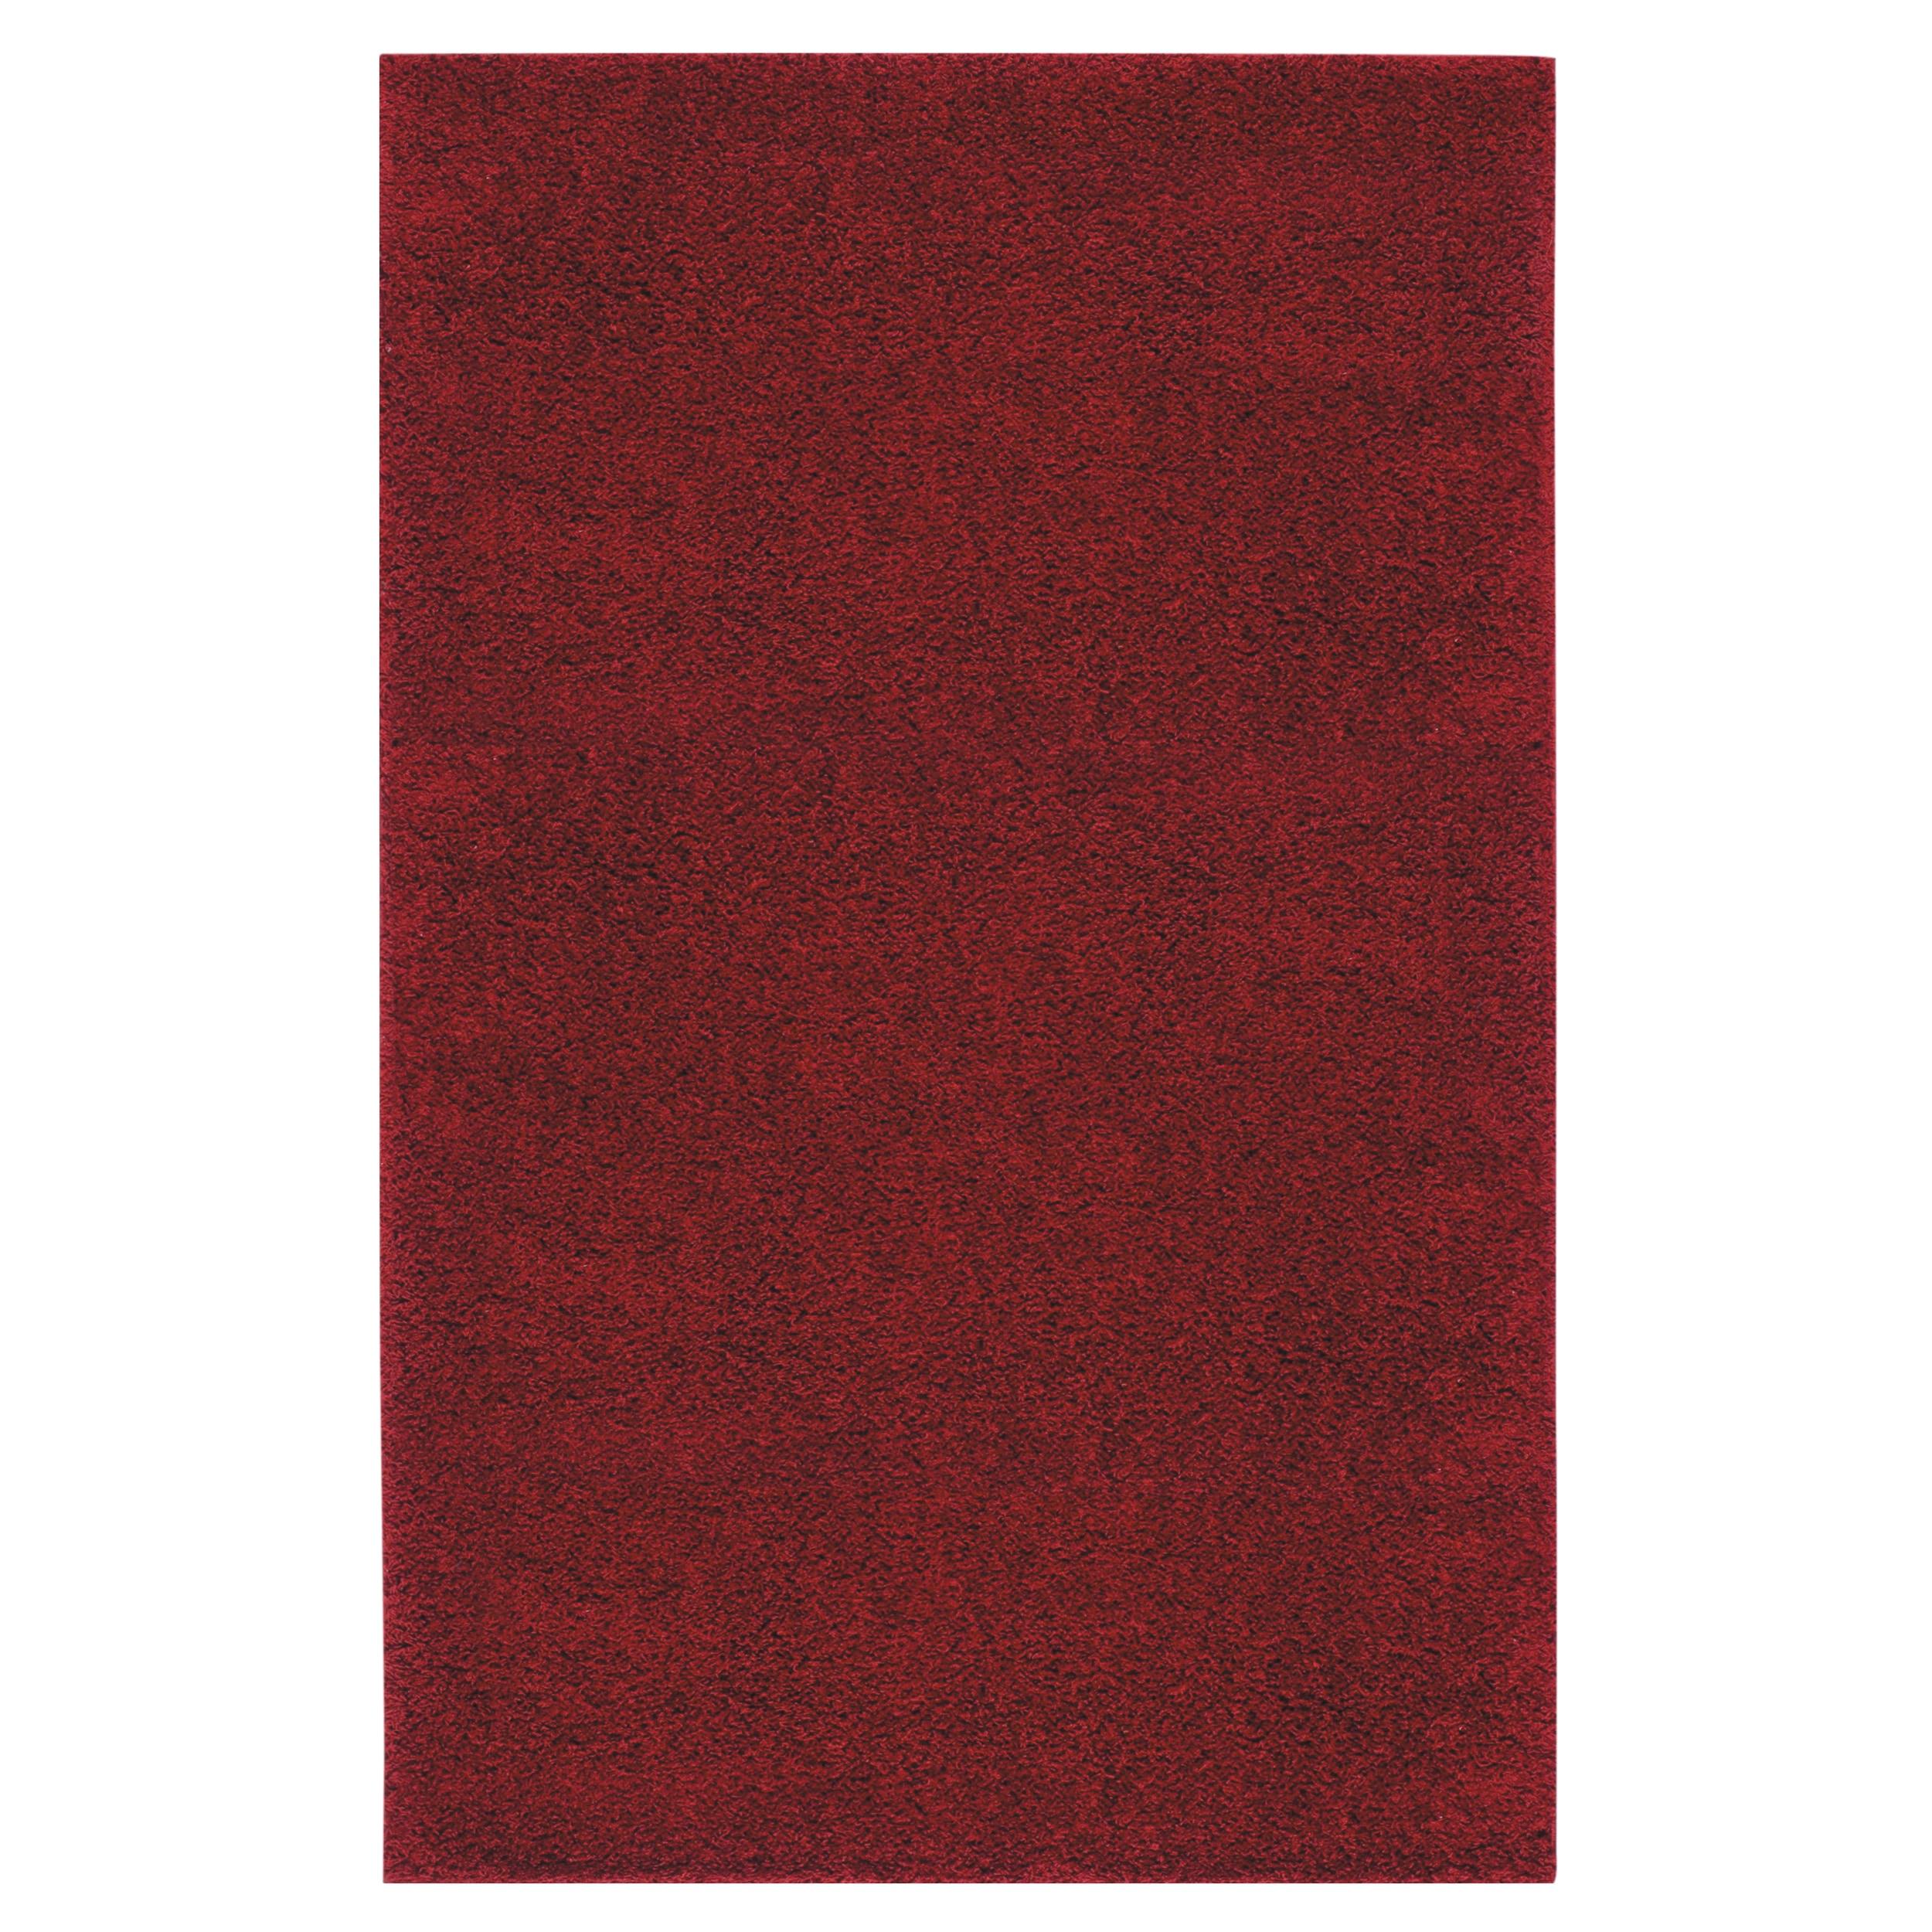 Solid Shag Crimson Red Rug (5' x 8')